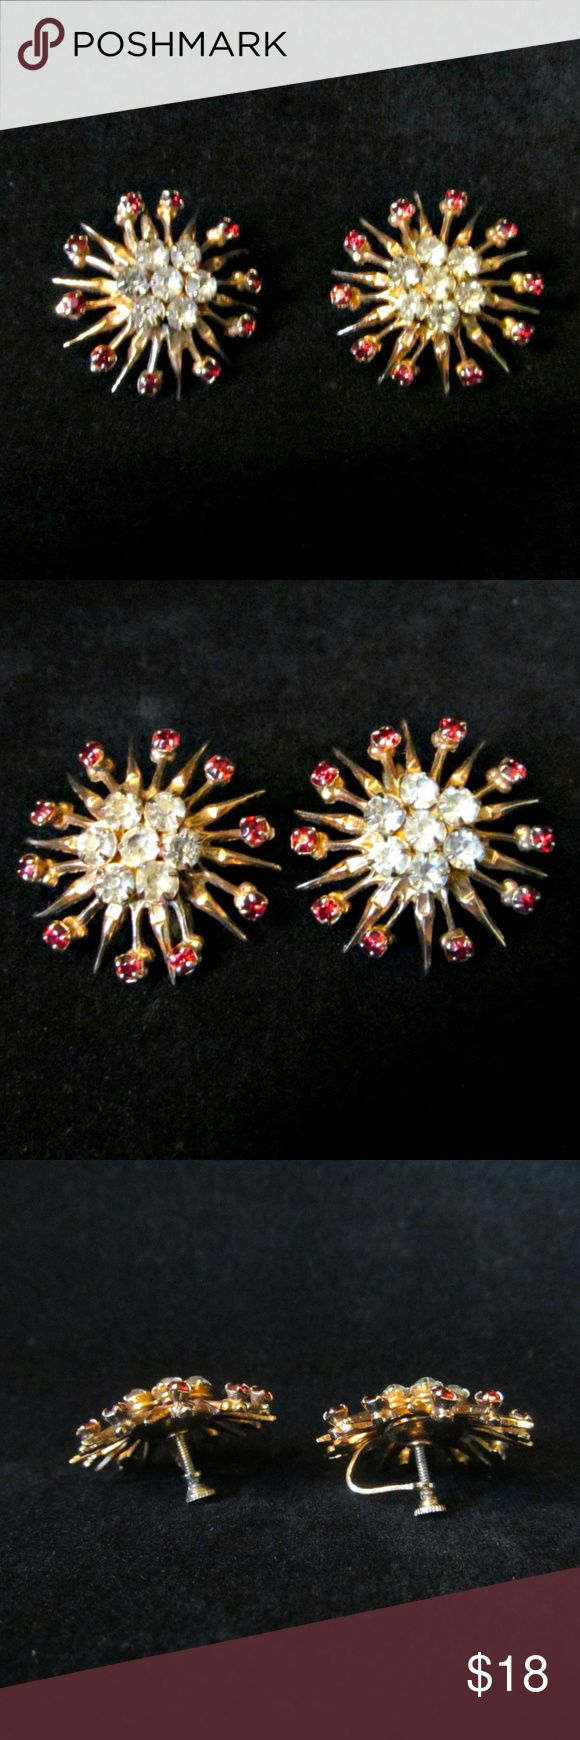 "Vintage '50s Starburst Red Rhinestone Earrings Vintage '50s Starburst Rhinestone Earrings Darling lightweight goldtone earrings with red and clear rhinestones and screw backs. Measure approx. 1"" in diameter. Condition: Very good vintage. Vintage Jewelry Earrings"